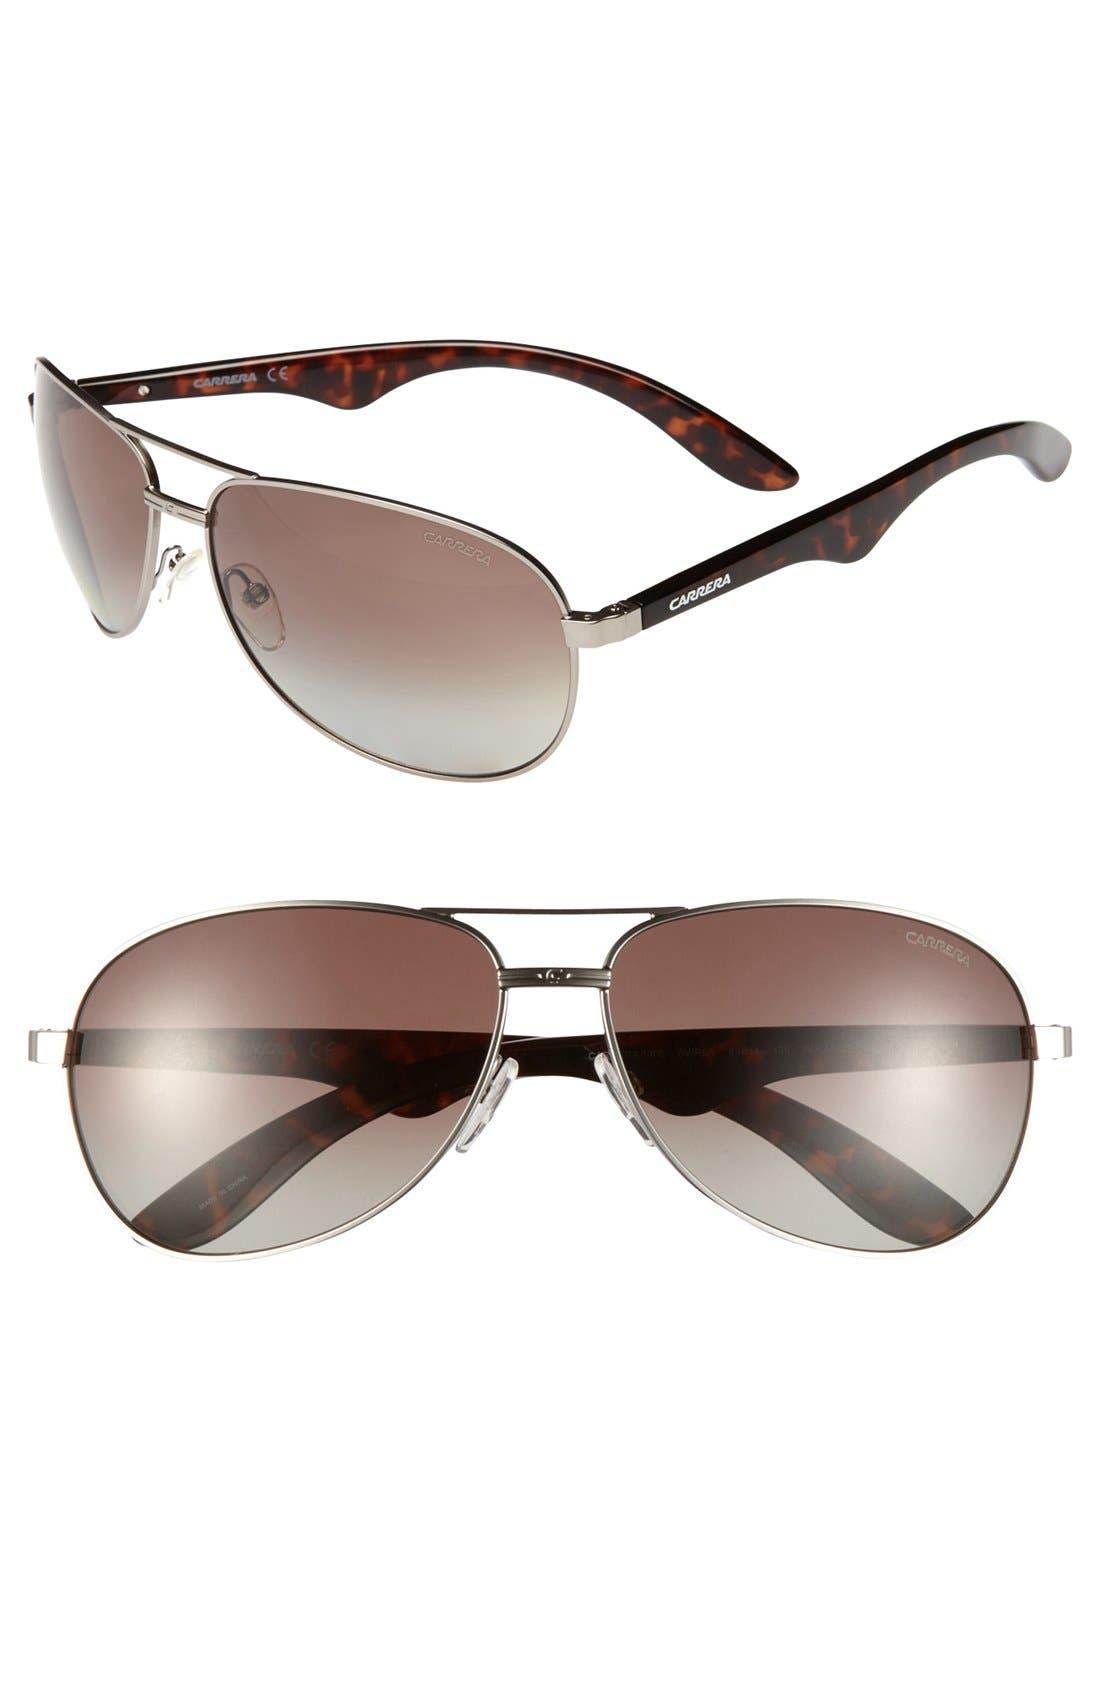 Alternate Image 1 Selected - Carrera Eyewear 63mm Stainless Steel Aviator Sunglasses